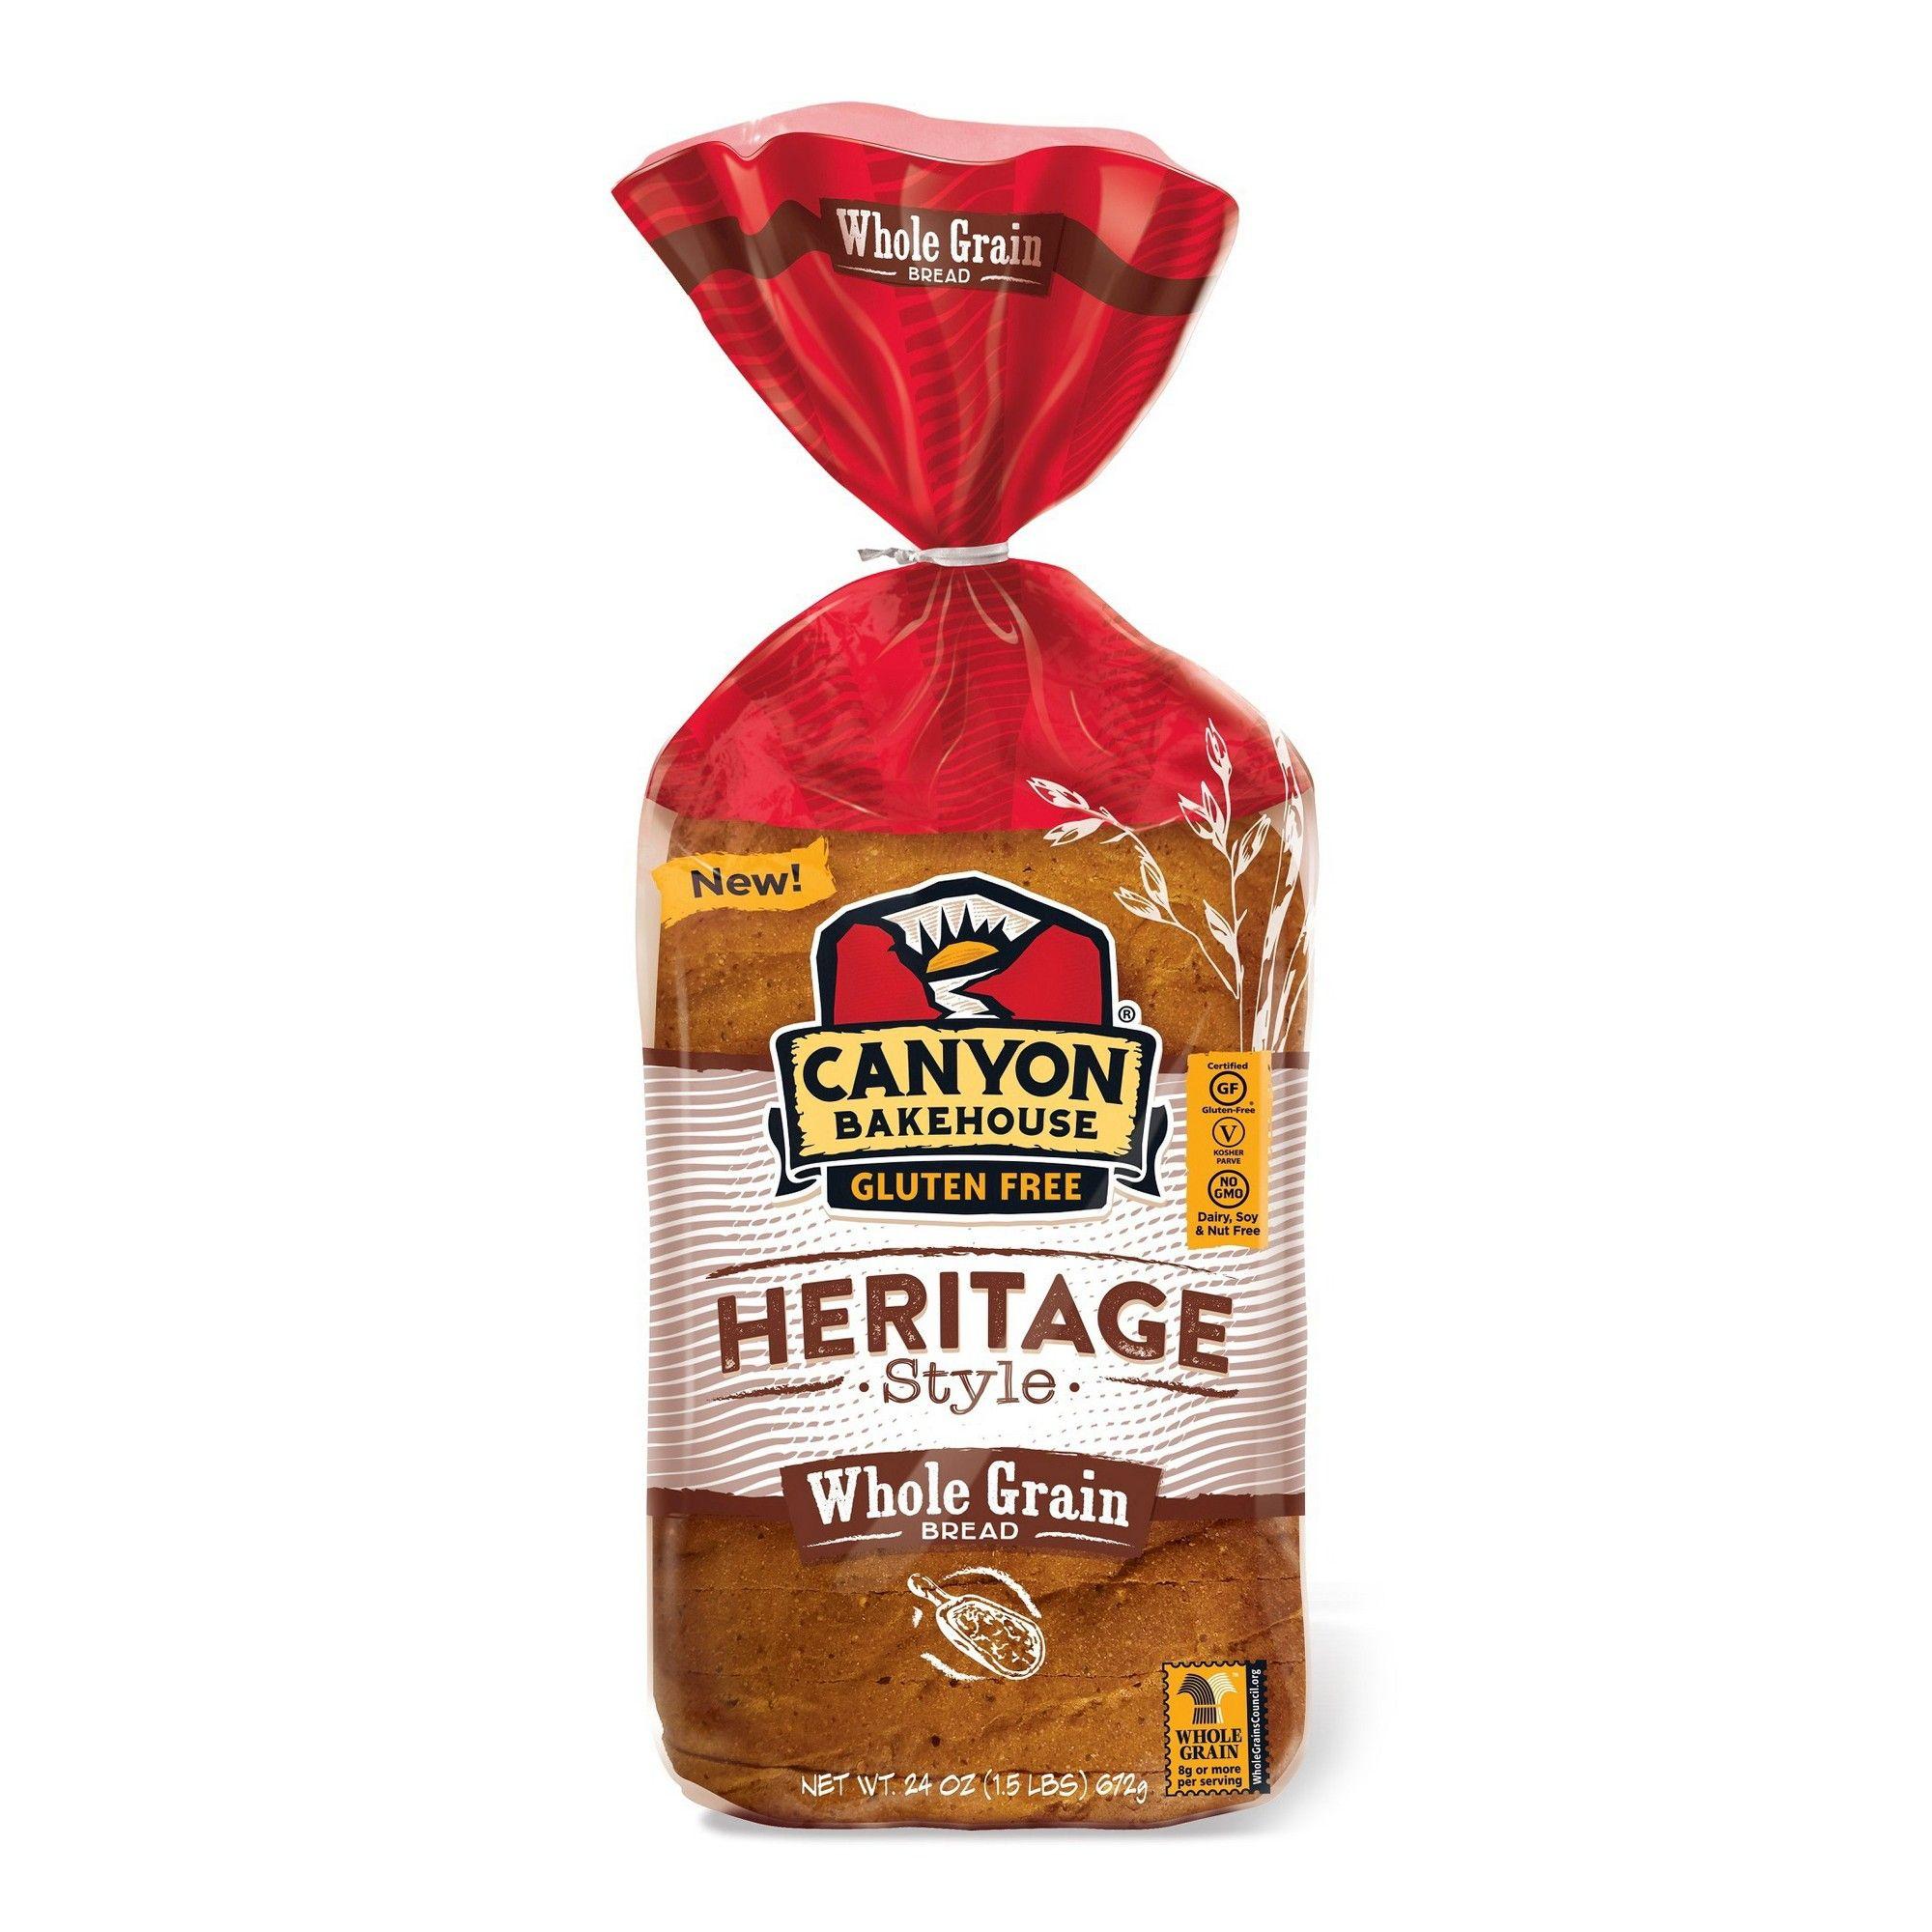 Canyon Bakehouse Gluten Free Heritage Whole Grain Bread